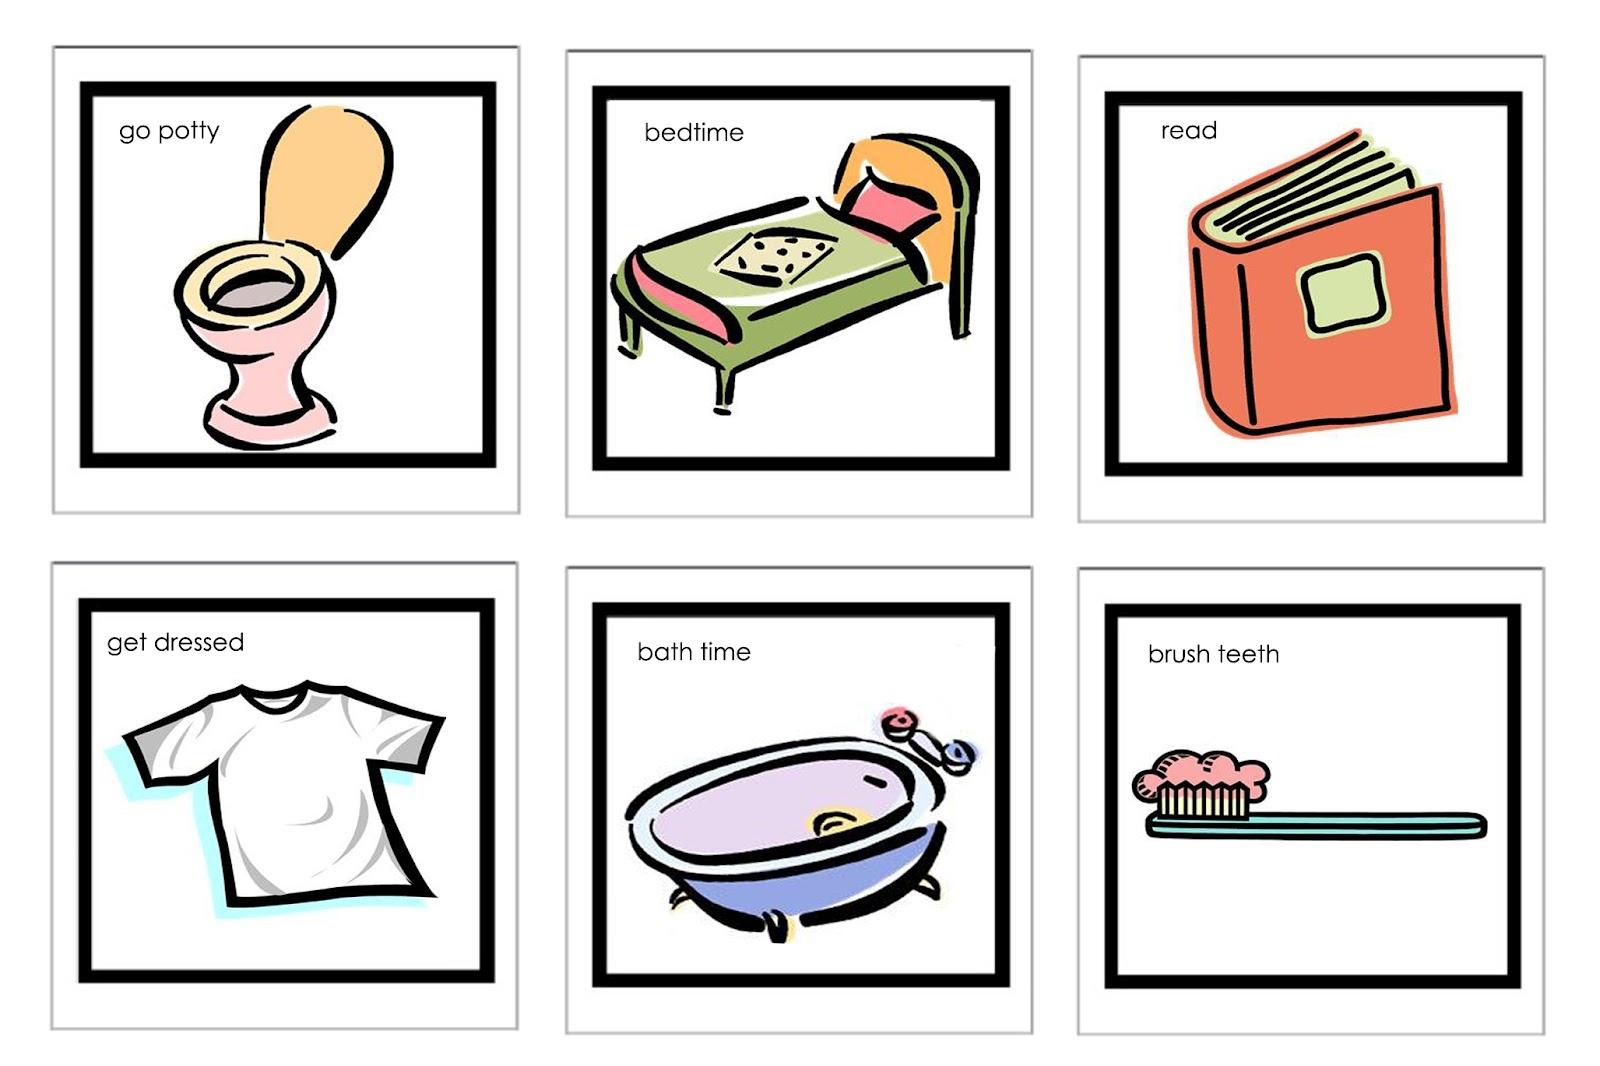 Free Preschool Cliparts Printables, Download Free Clip Art, Free - Free Printable Picture Schedule For Preschool